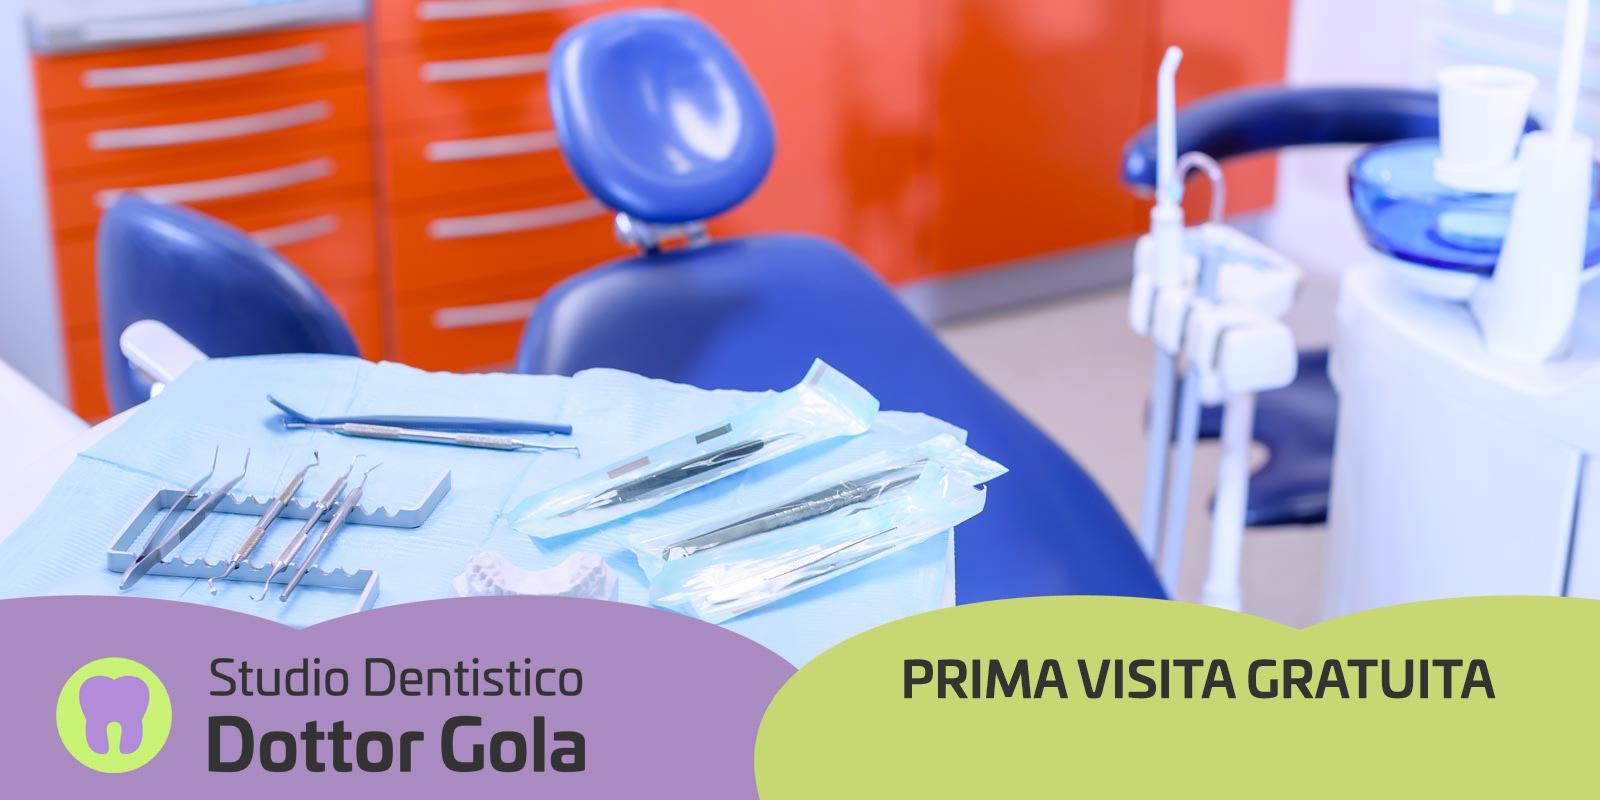 Prima-visita-gratuita-dentista-gola-casteggio-pavia